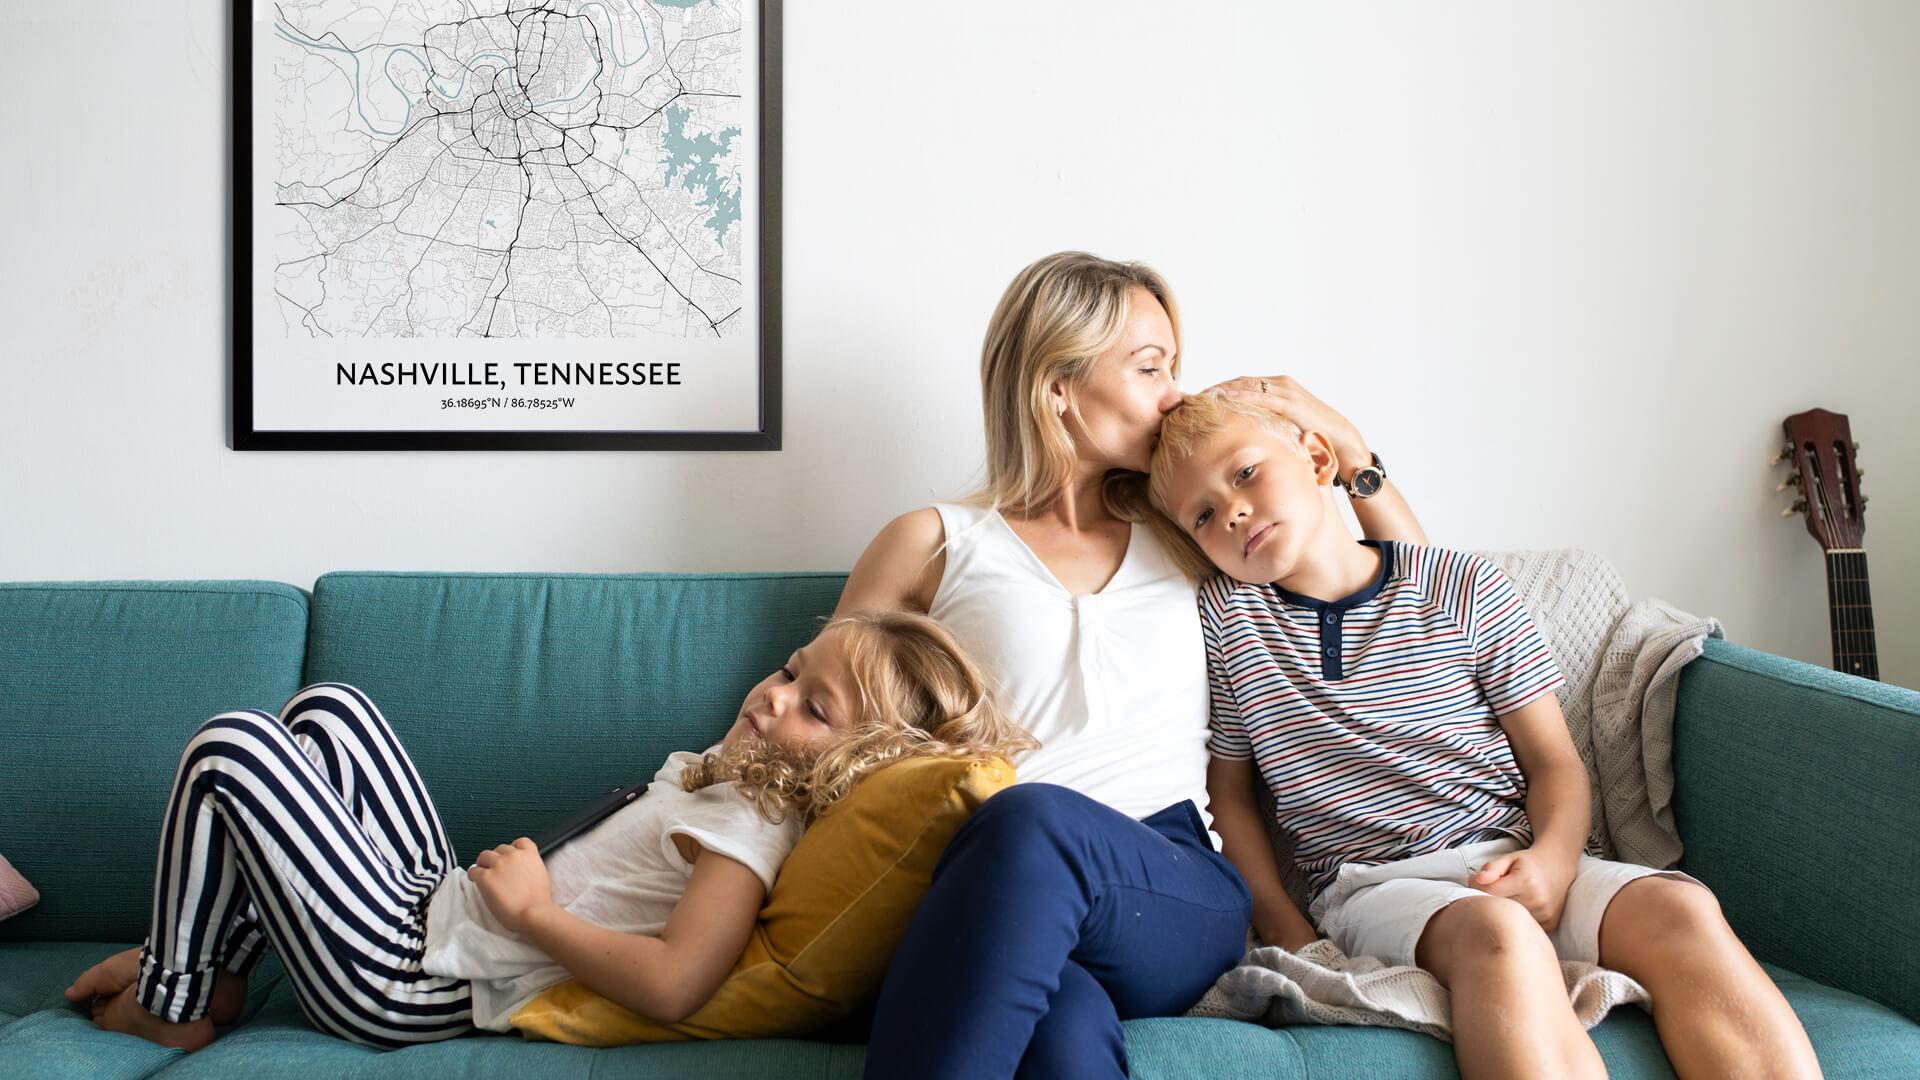 Nashville map poster